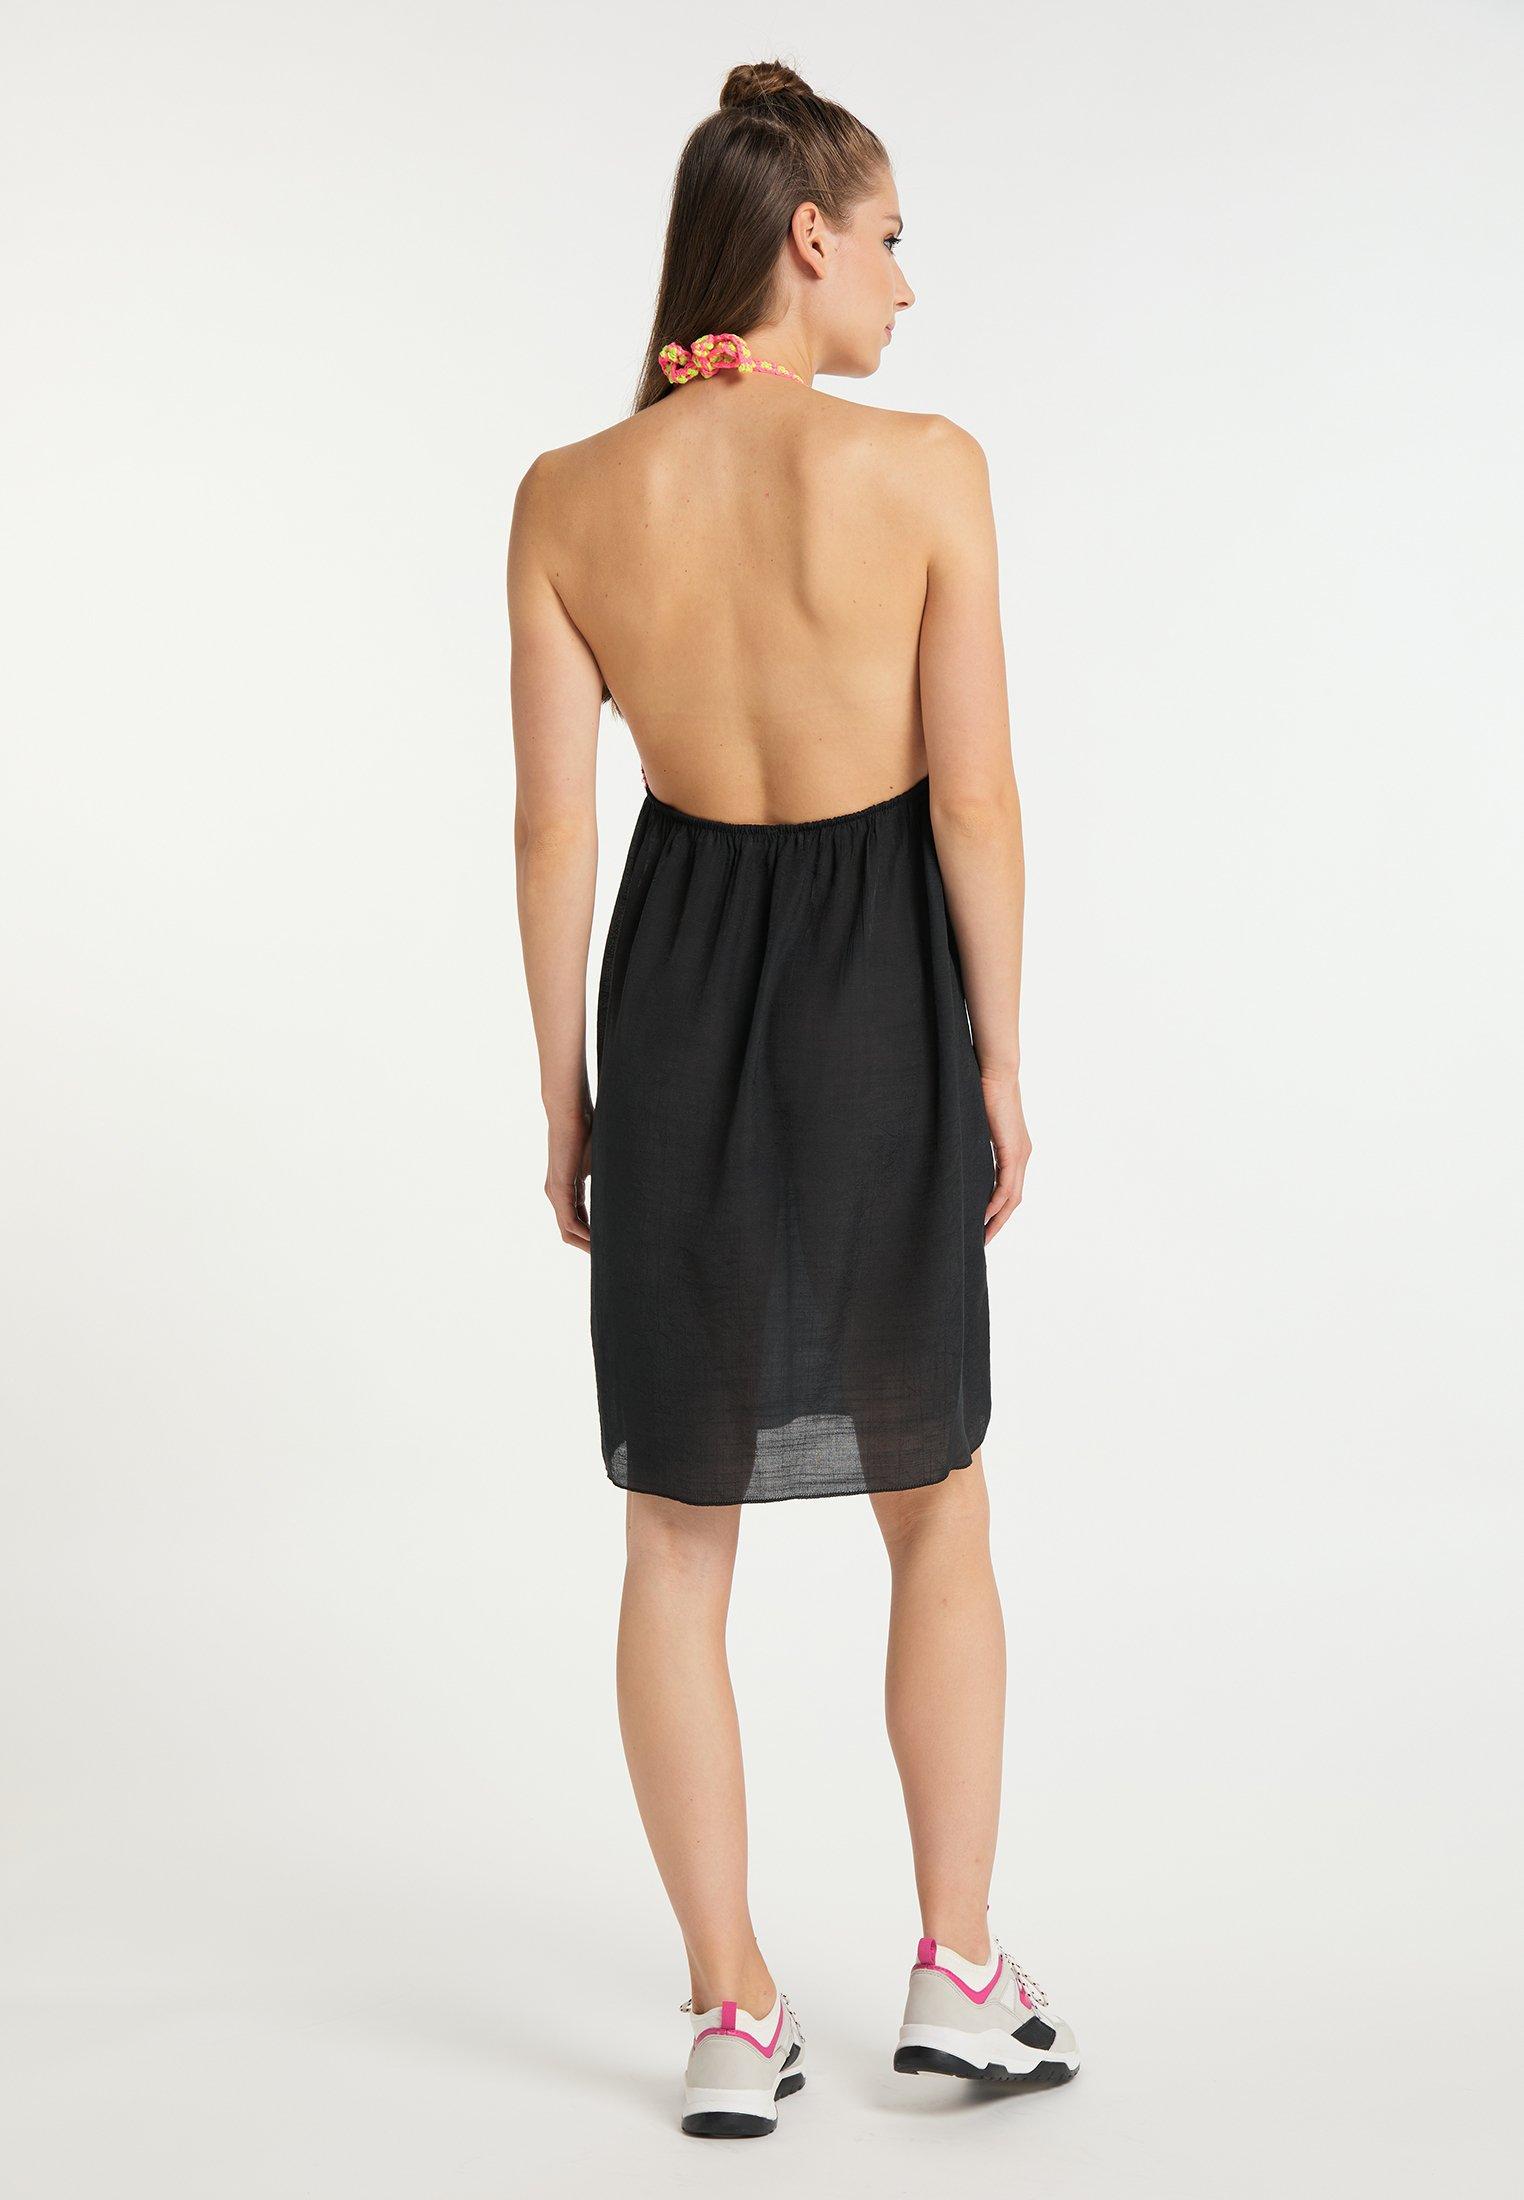 Particular Discount Women's Clothing myMo Day dress schwarz 6Ojx9oIt6